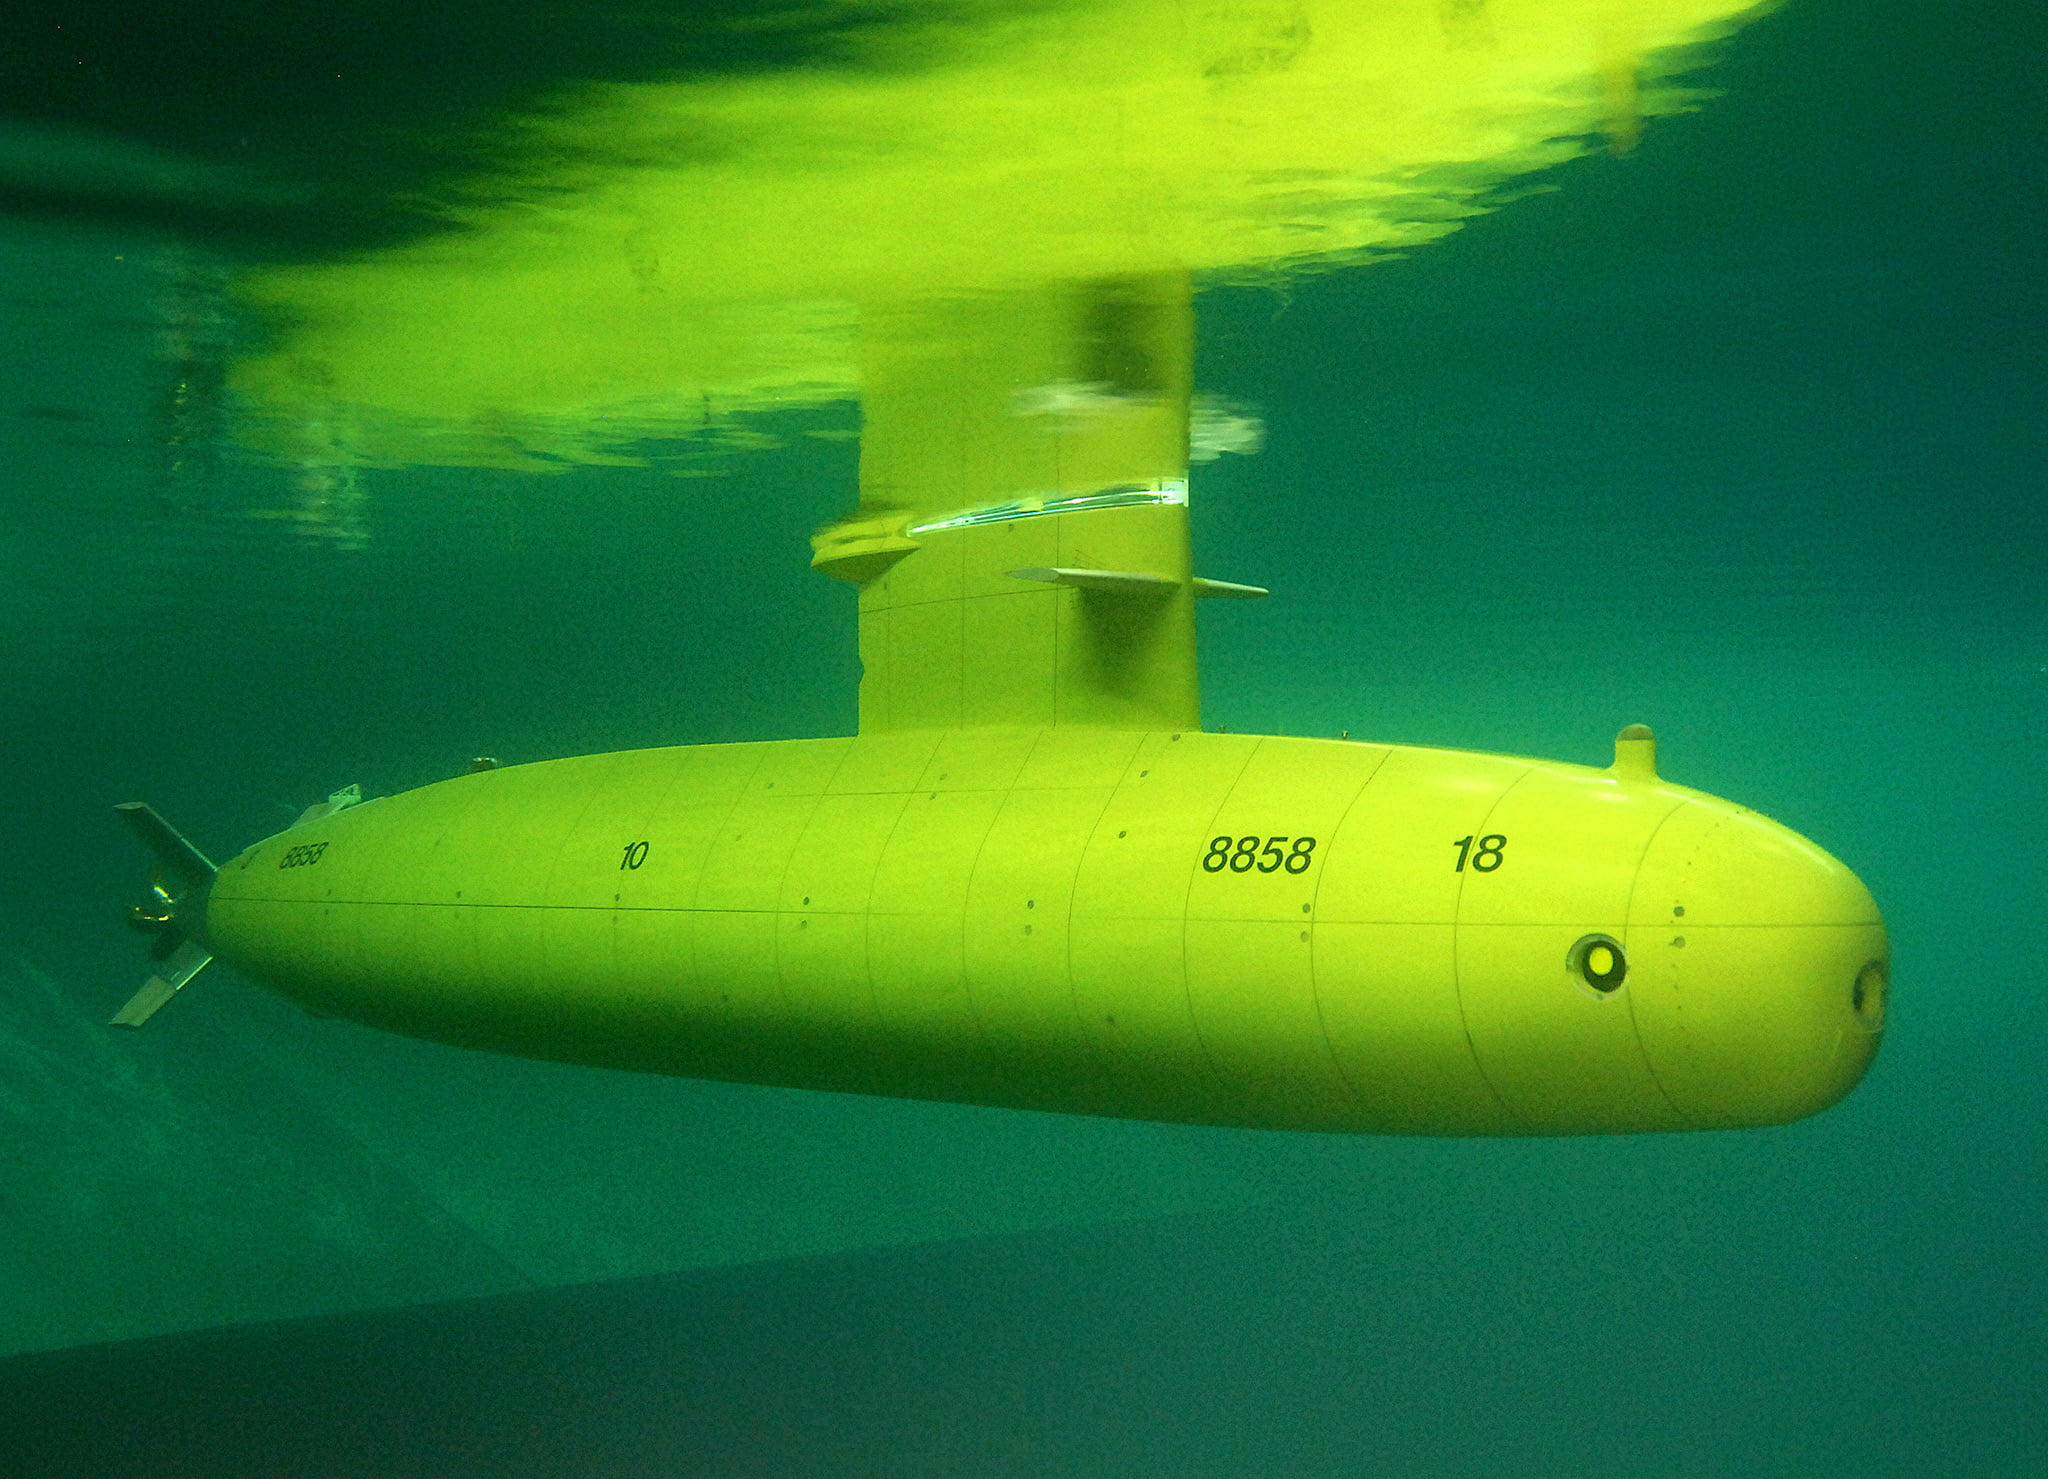 Submarine model.